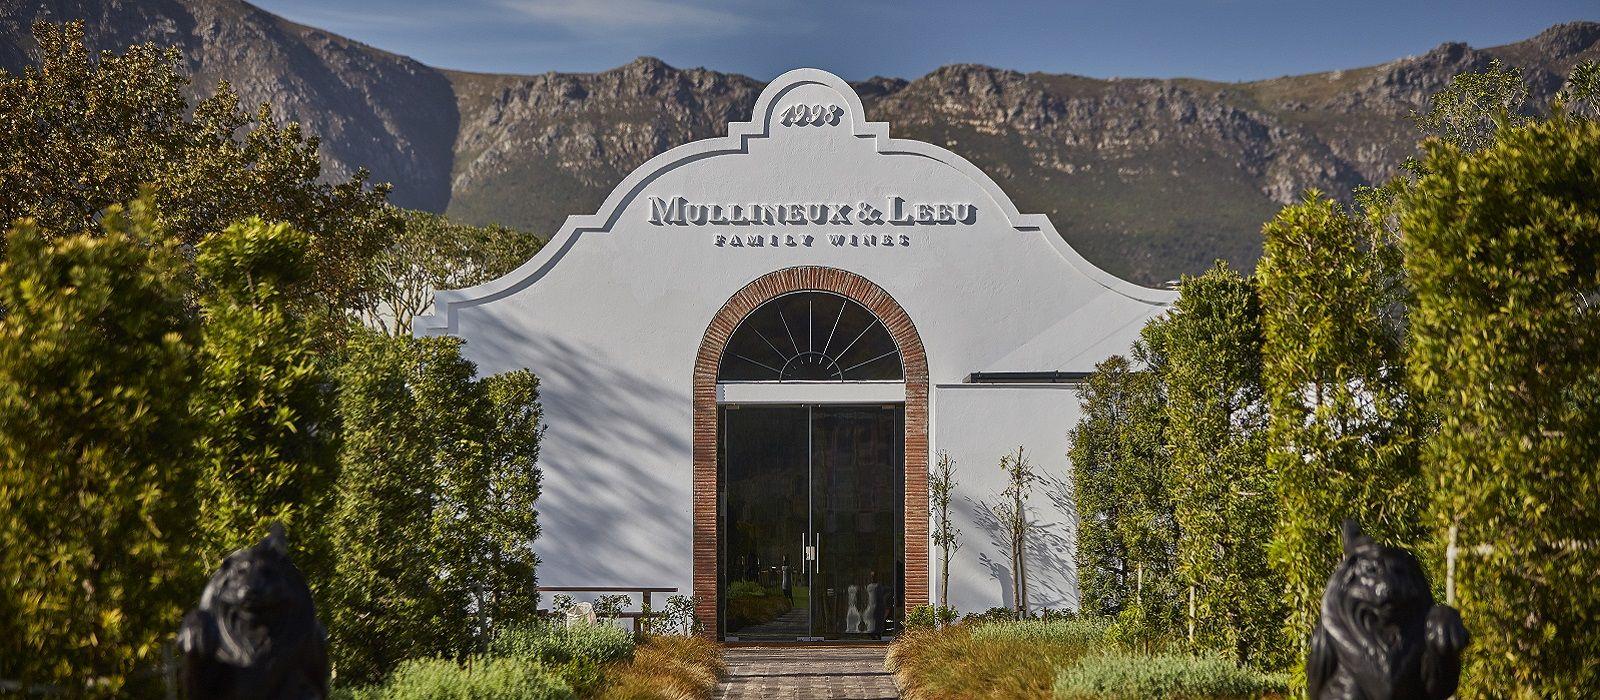 Hotel Leeu Estates South Africa